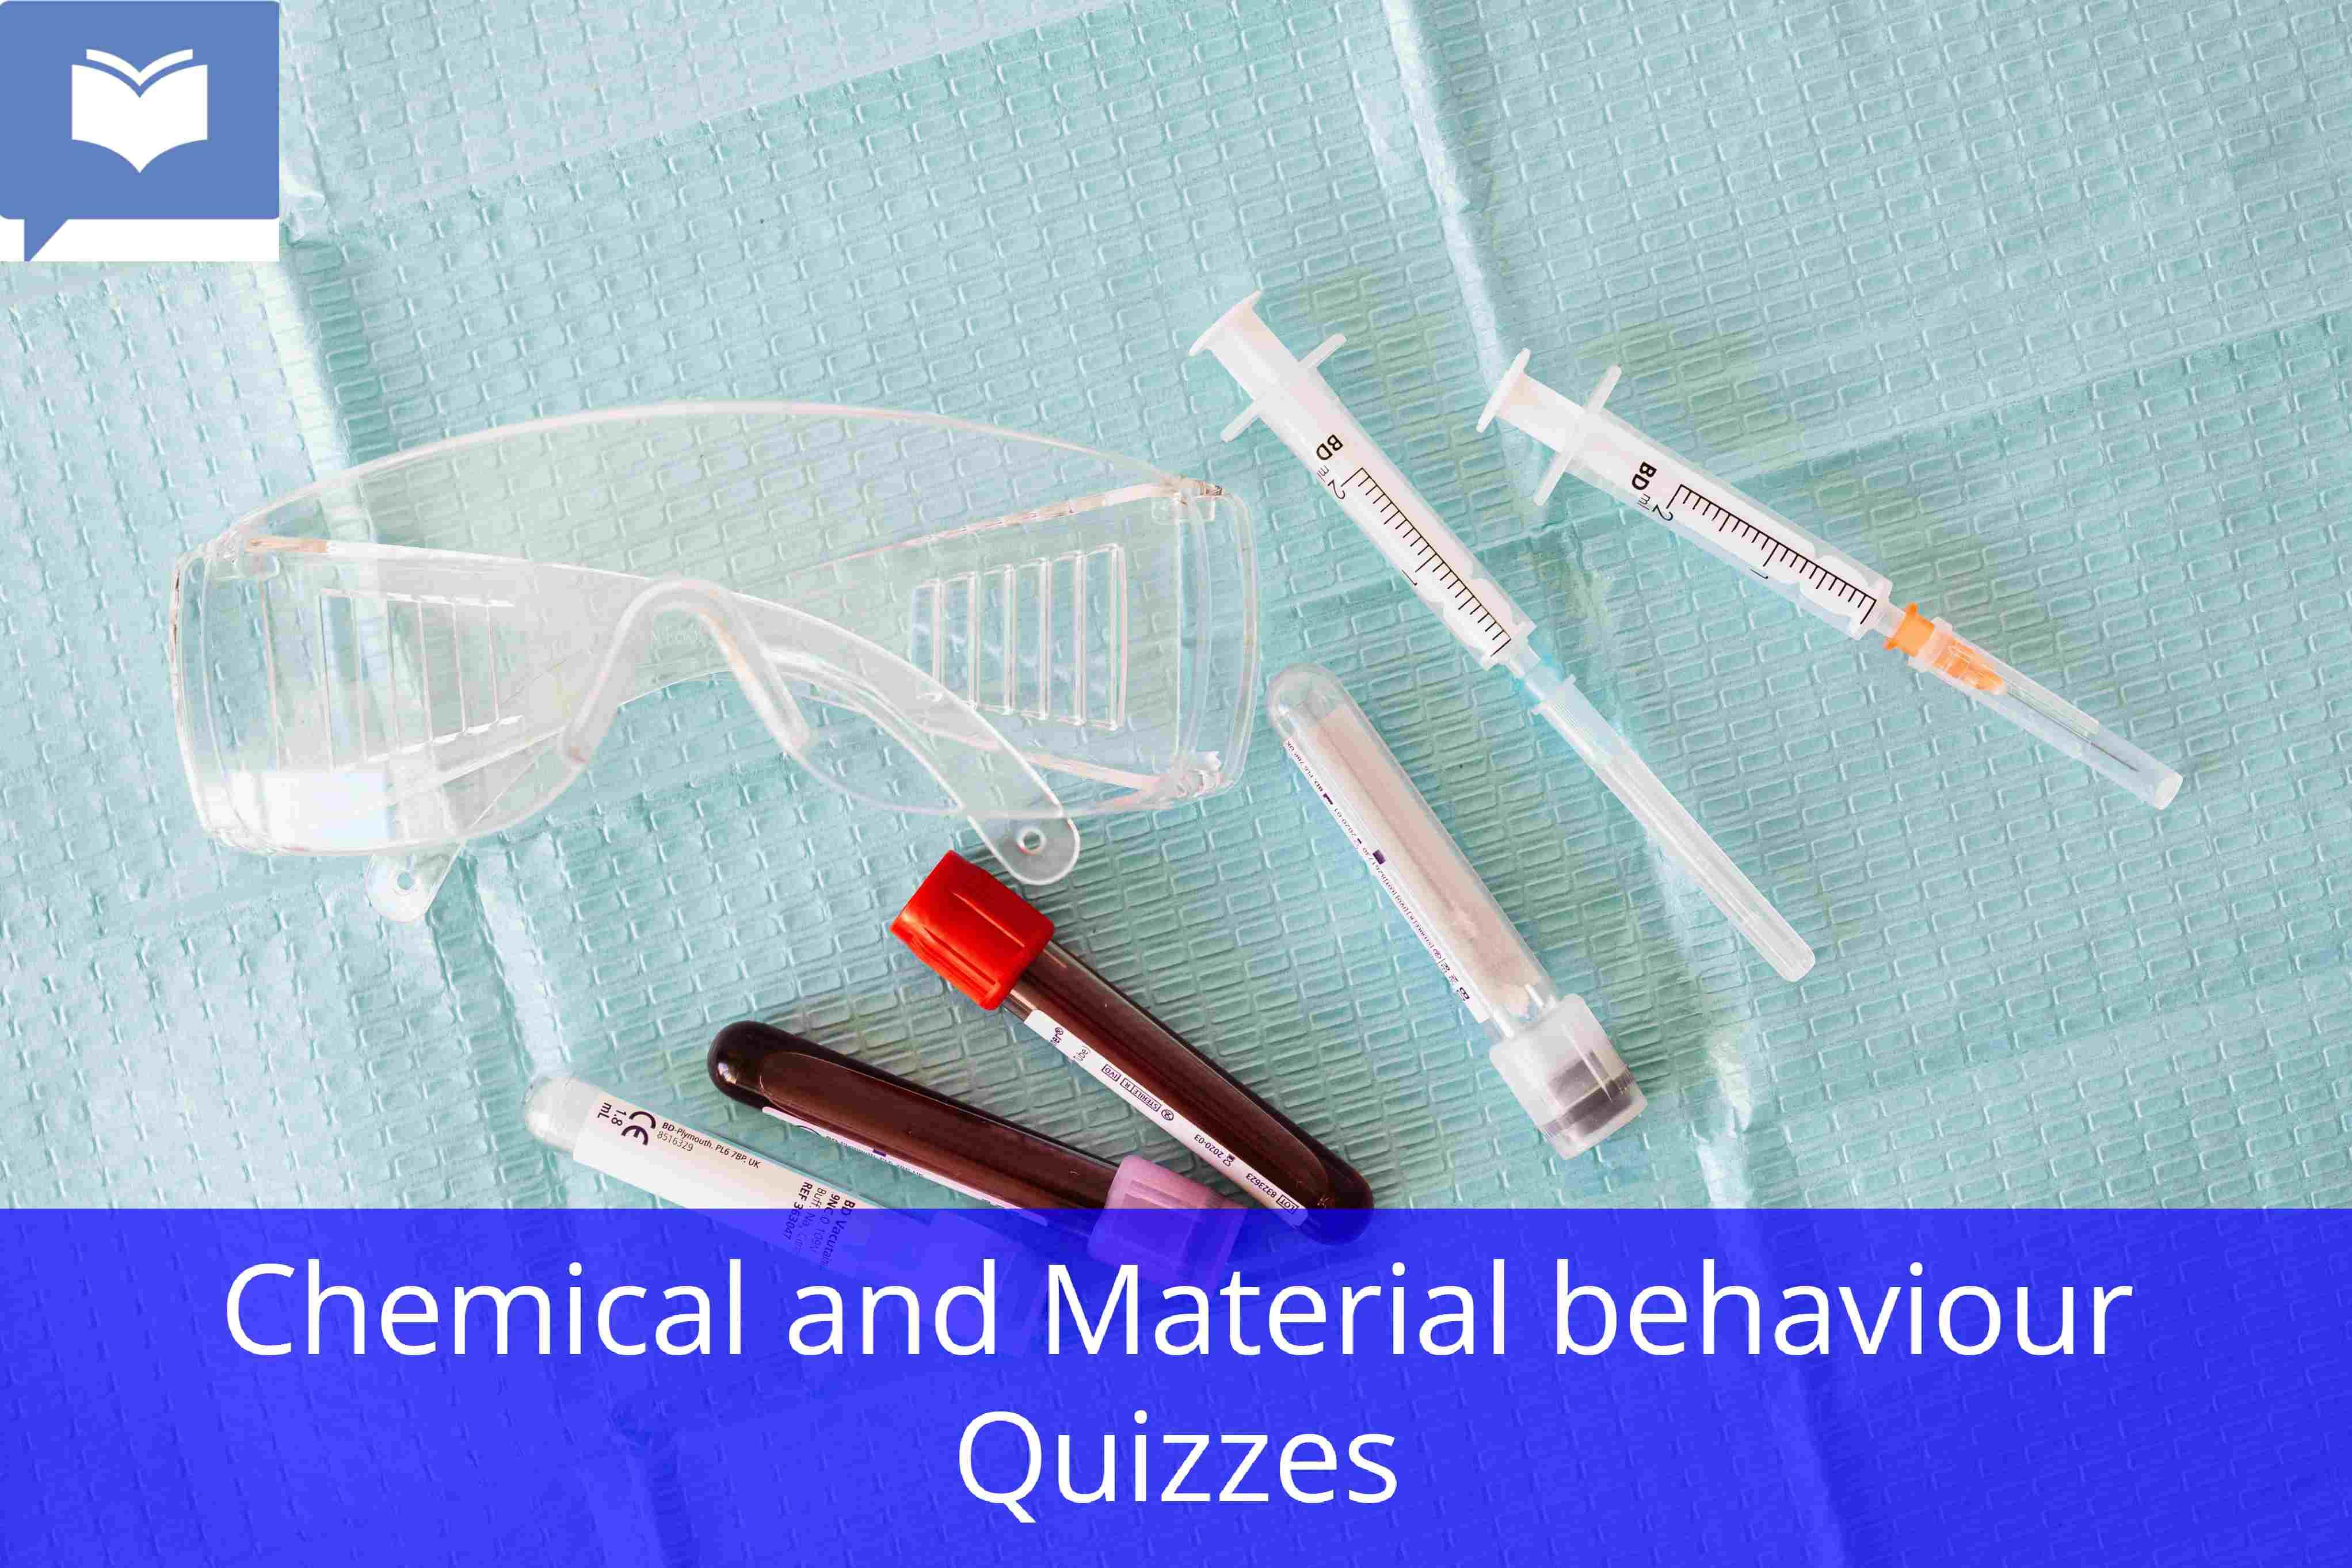 Chemical and material behavior quiz